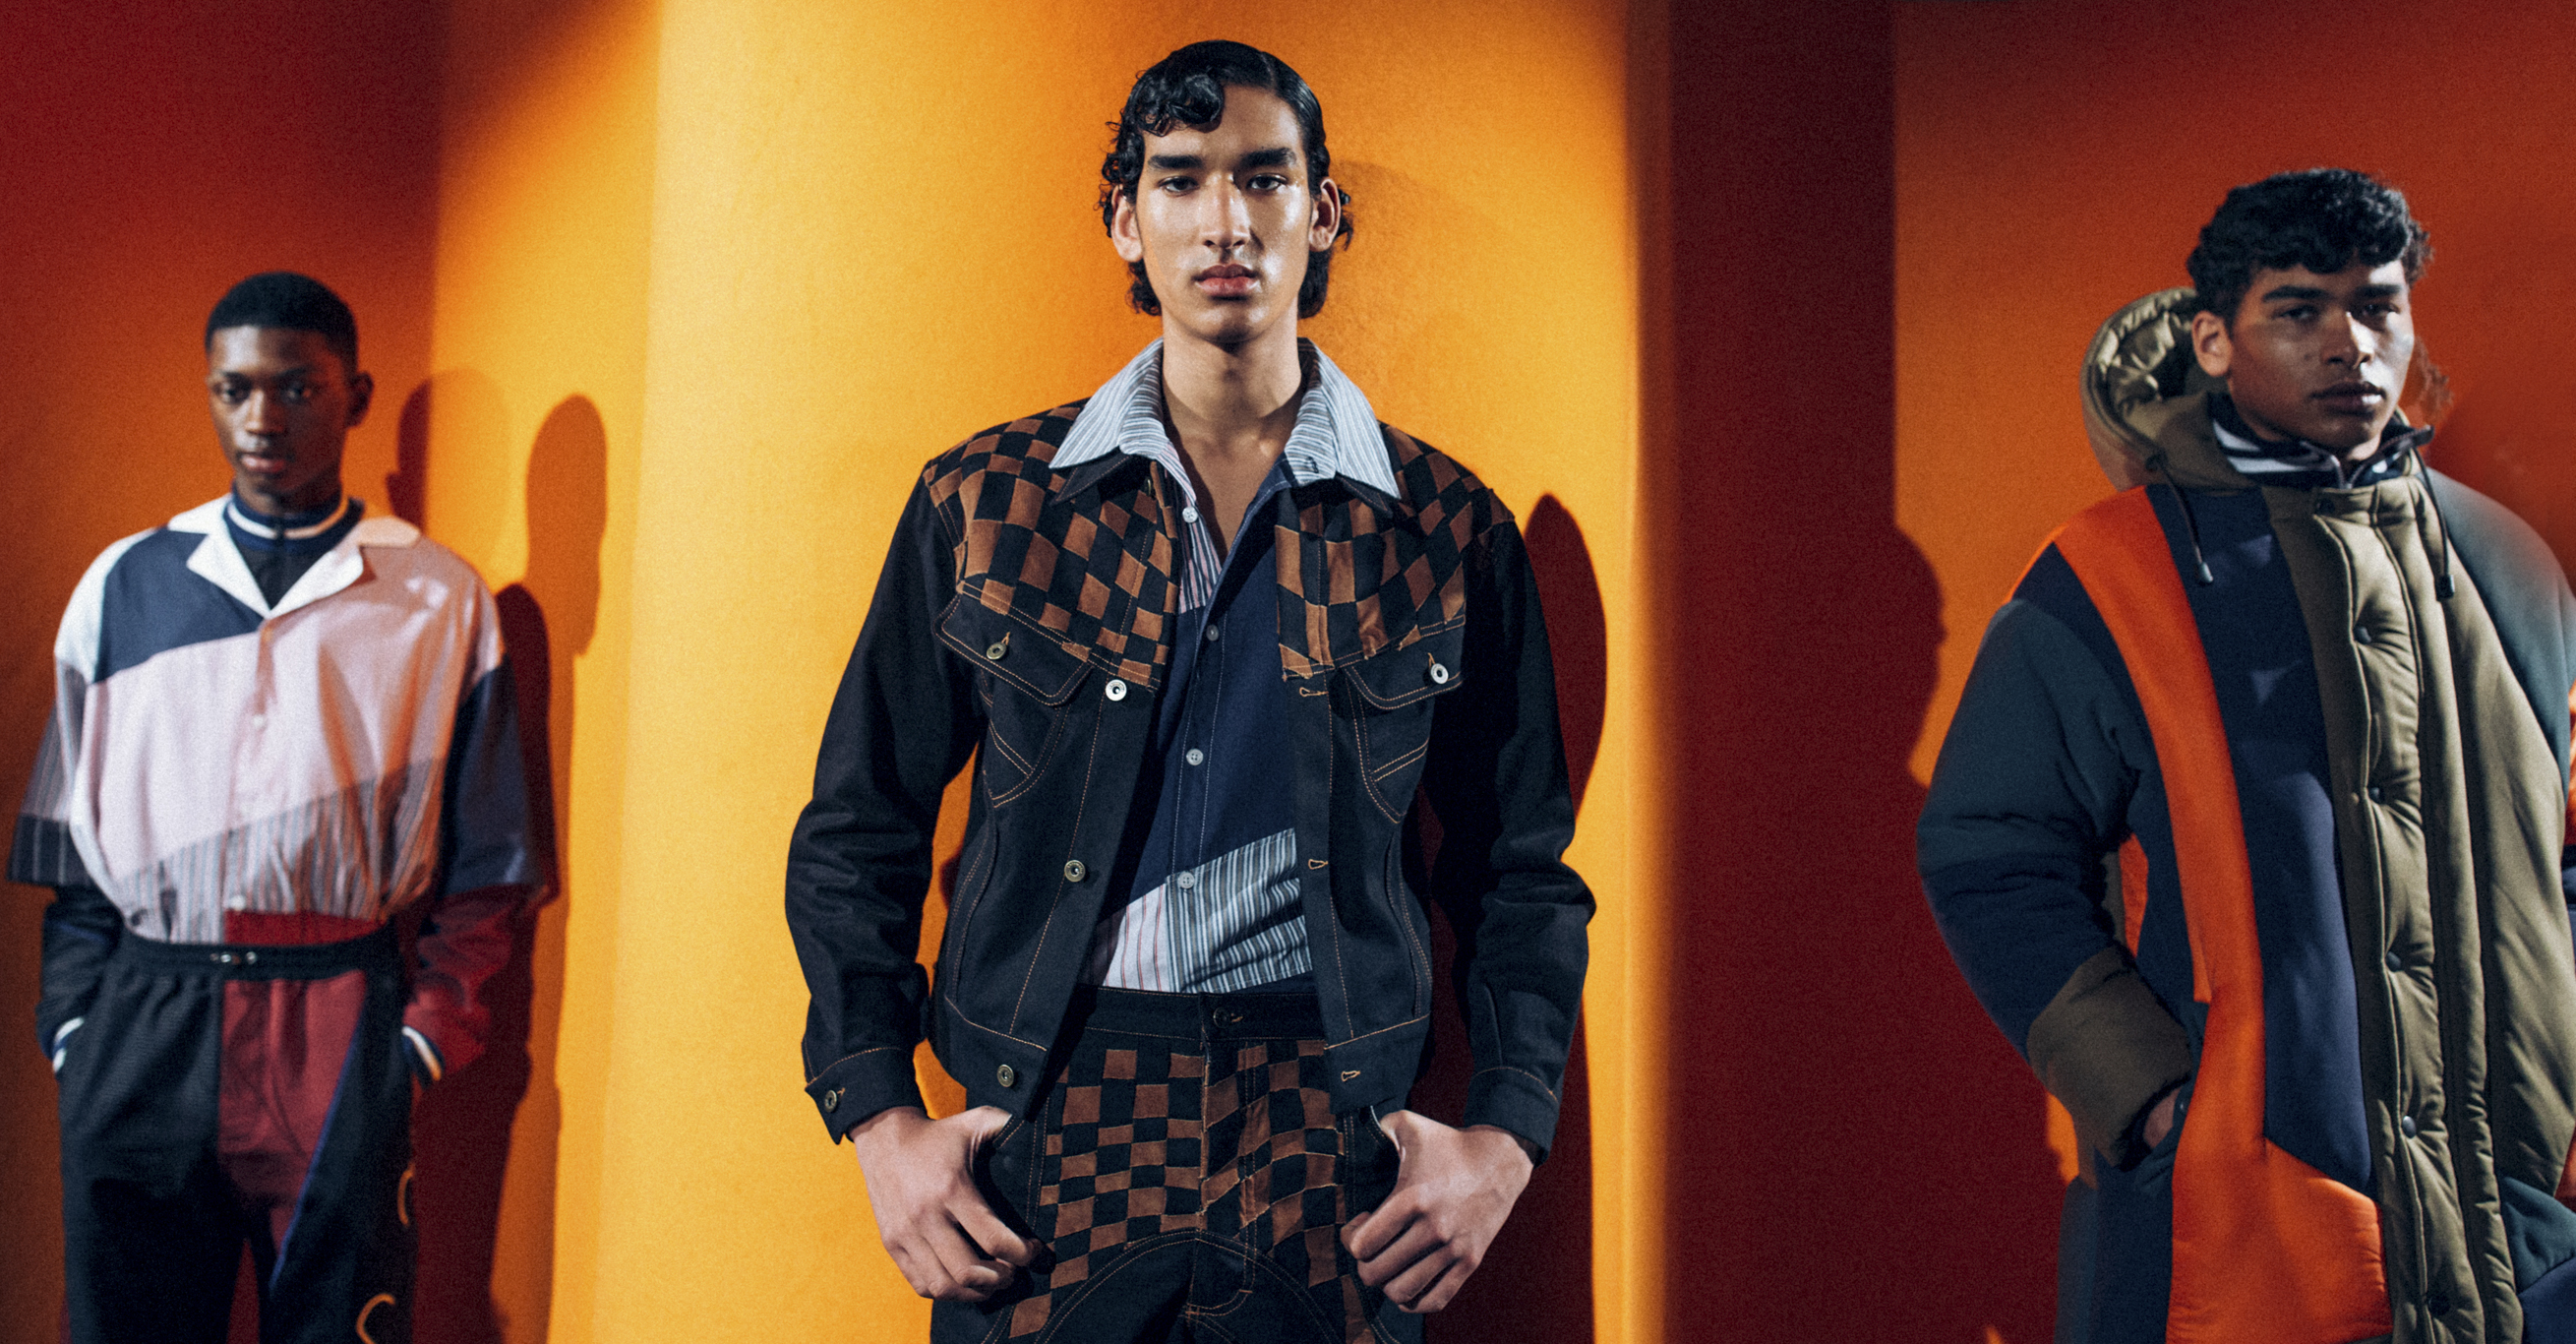 Ahluwalia Studio LFW Men's Fall 2020, photographed in London on 05 January 2020